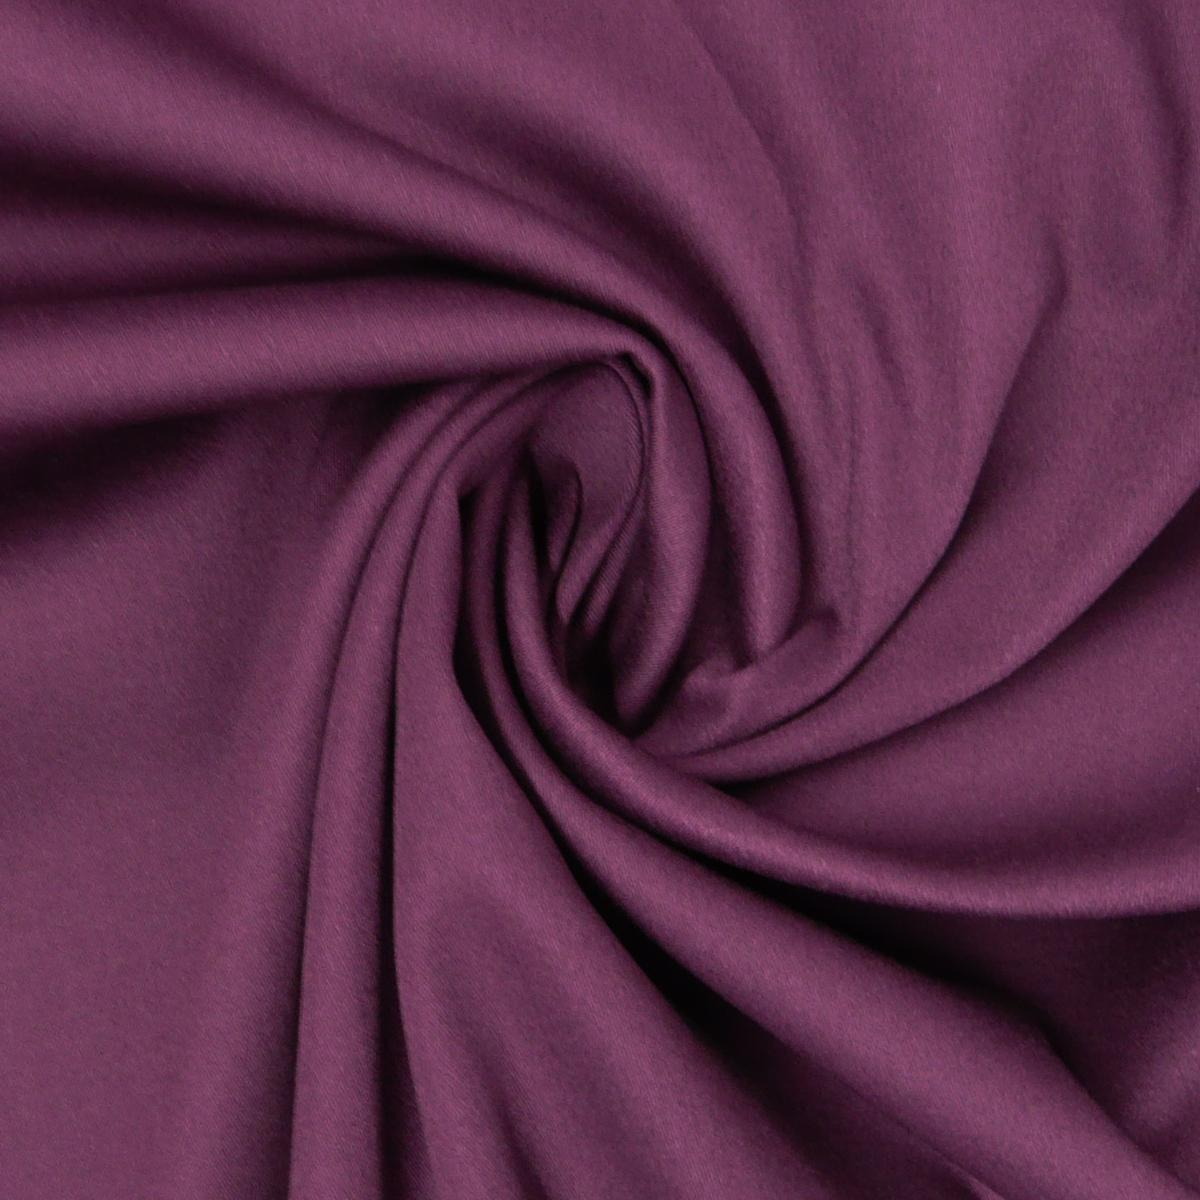 Baumwolle Stoff Meterware Satin Spandex lila 1,45m Breite